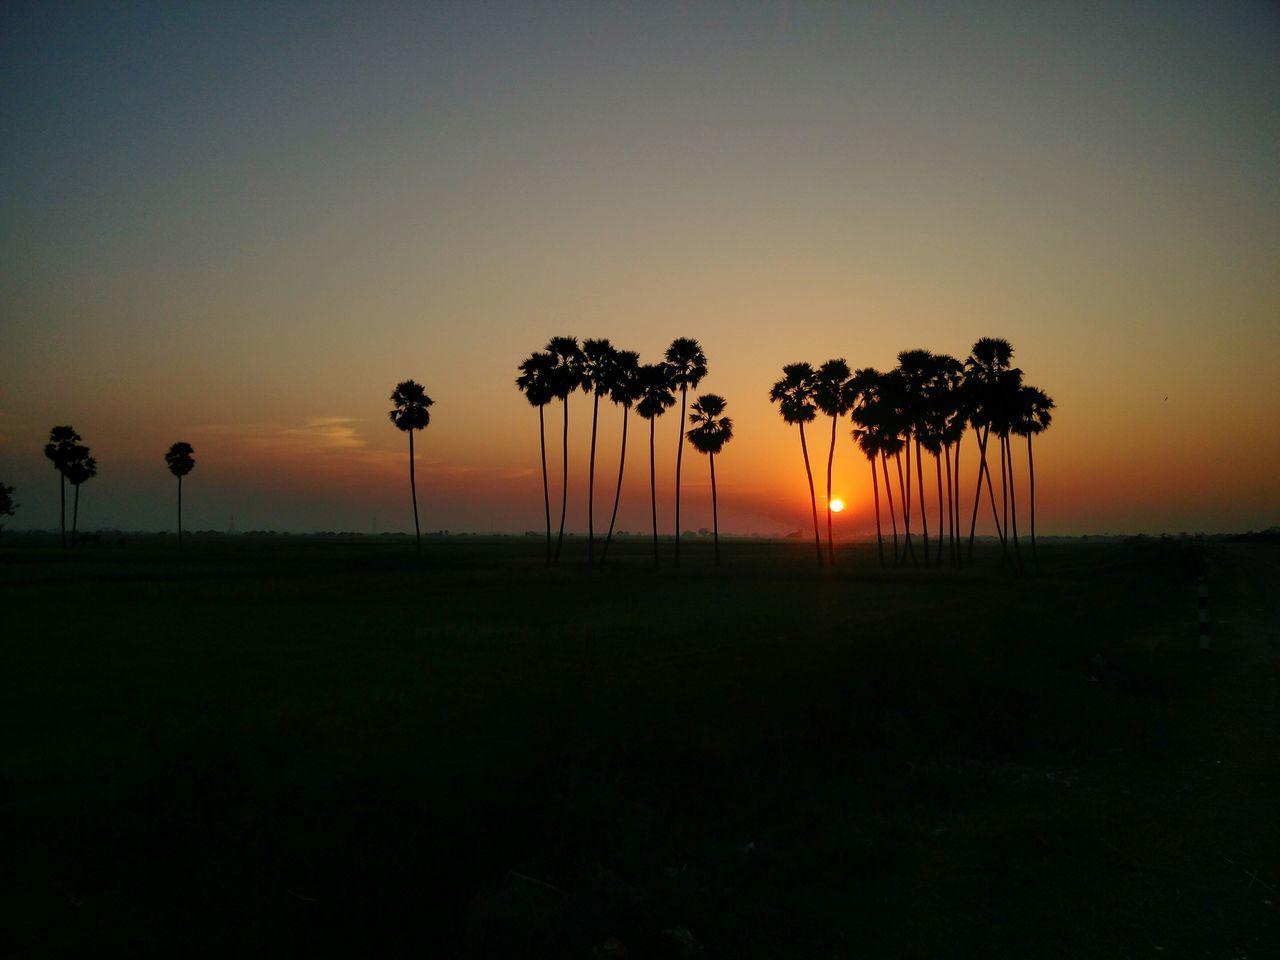 Sunset Dusk Silhouette Travel Outdoors Palm Tree Landscape Sky Tree Travel Destinations Cloud - Sky No People Nature EyeEm Best Shots EyeEmBestPics EyeEm Gallery Eyeemphotography Beauty In Nature Colors Oneplus2 Oneplusphotograpgy India Indiapictures